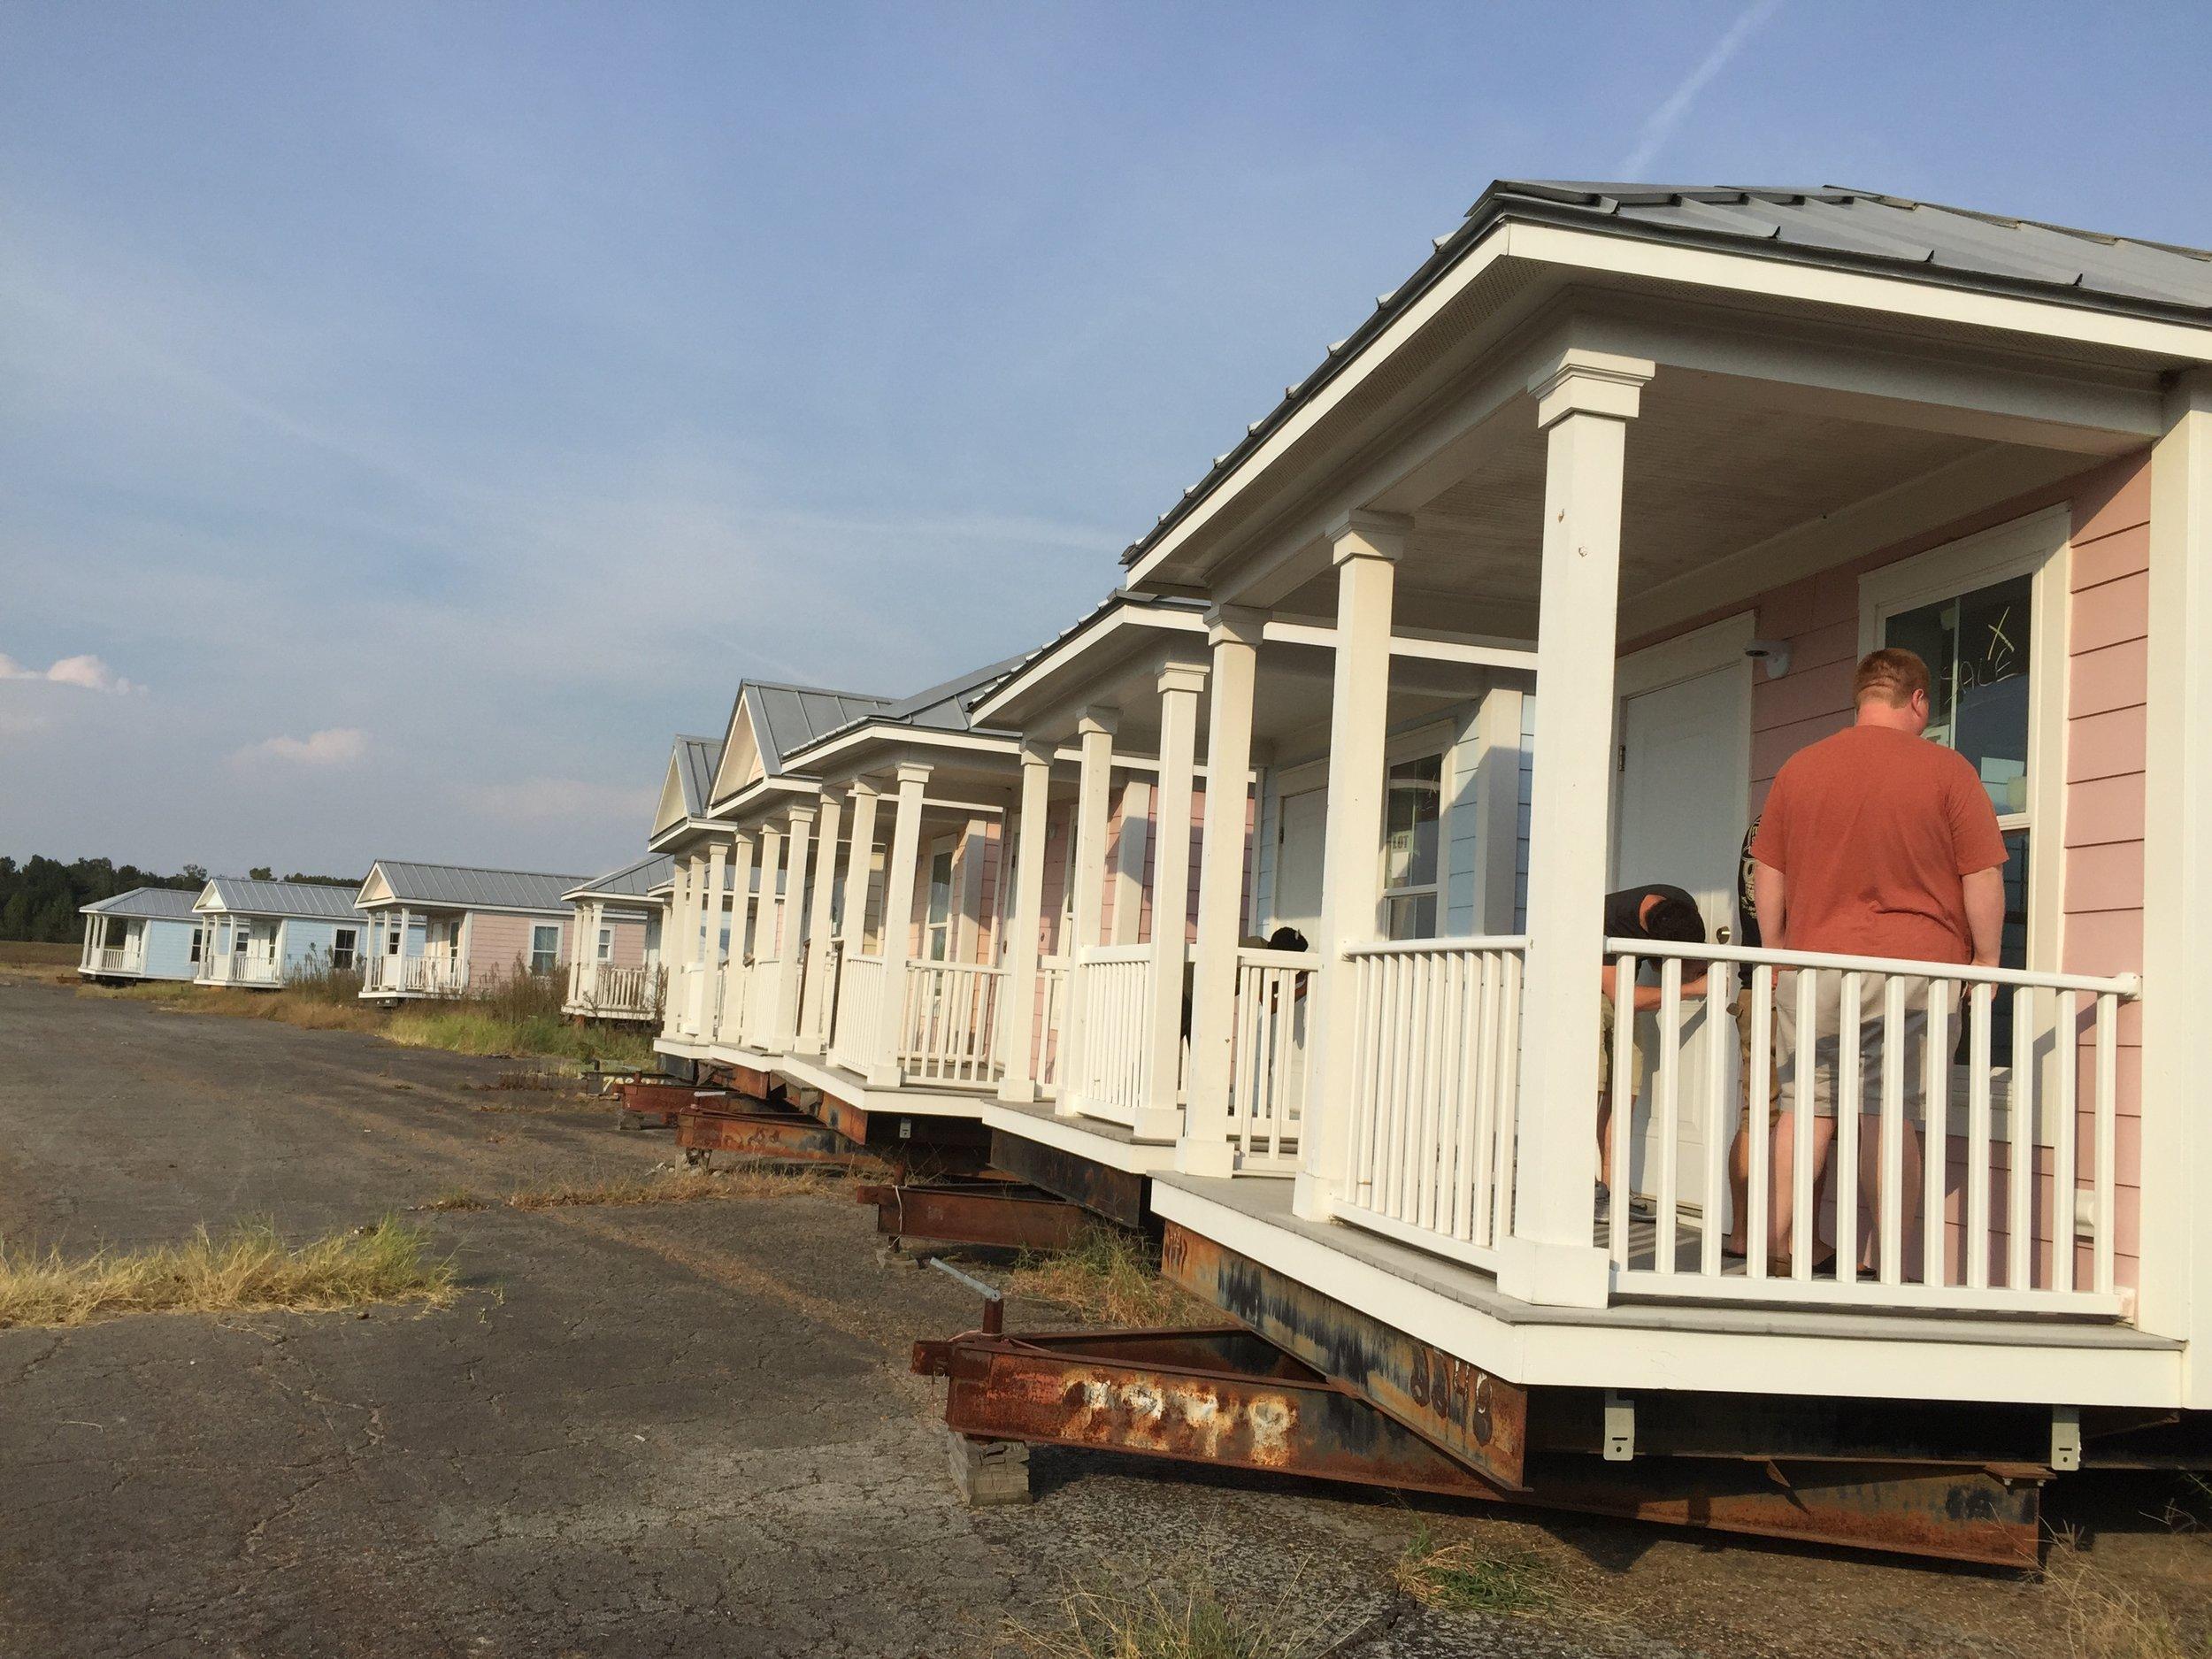 ARCH594-2015-Keddy-Katrina Cottages in Greenwood.JPG